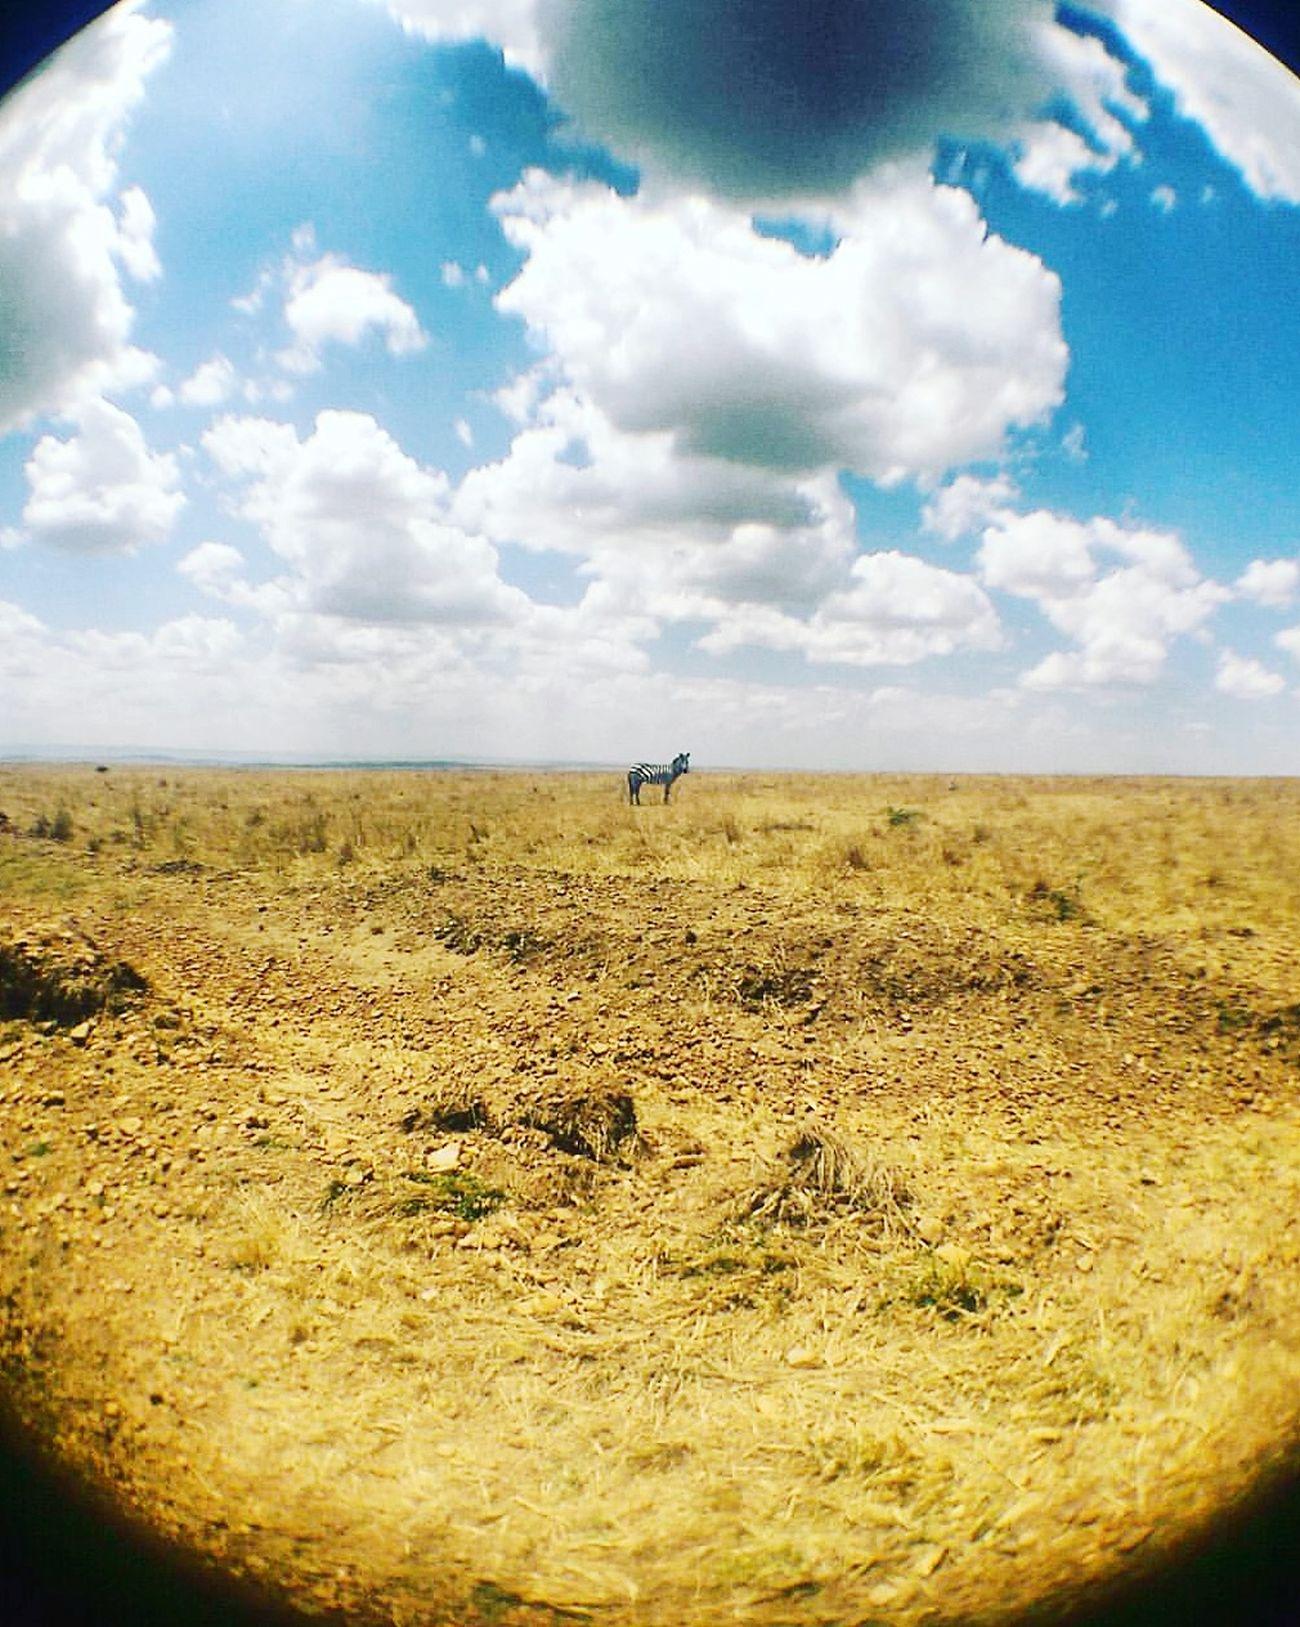 Kenya Safari Animals Outdoors Cloud - Sky Day Desert Nature Zebra Wildlife